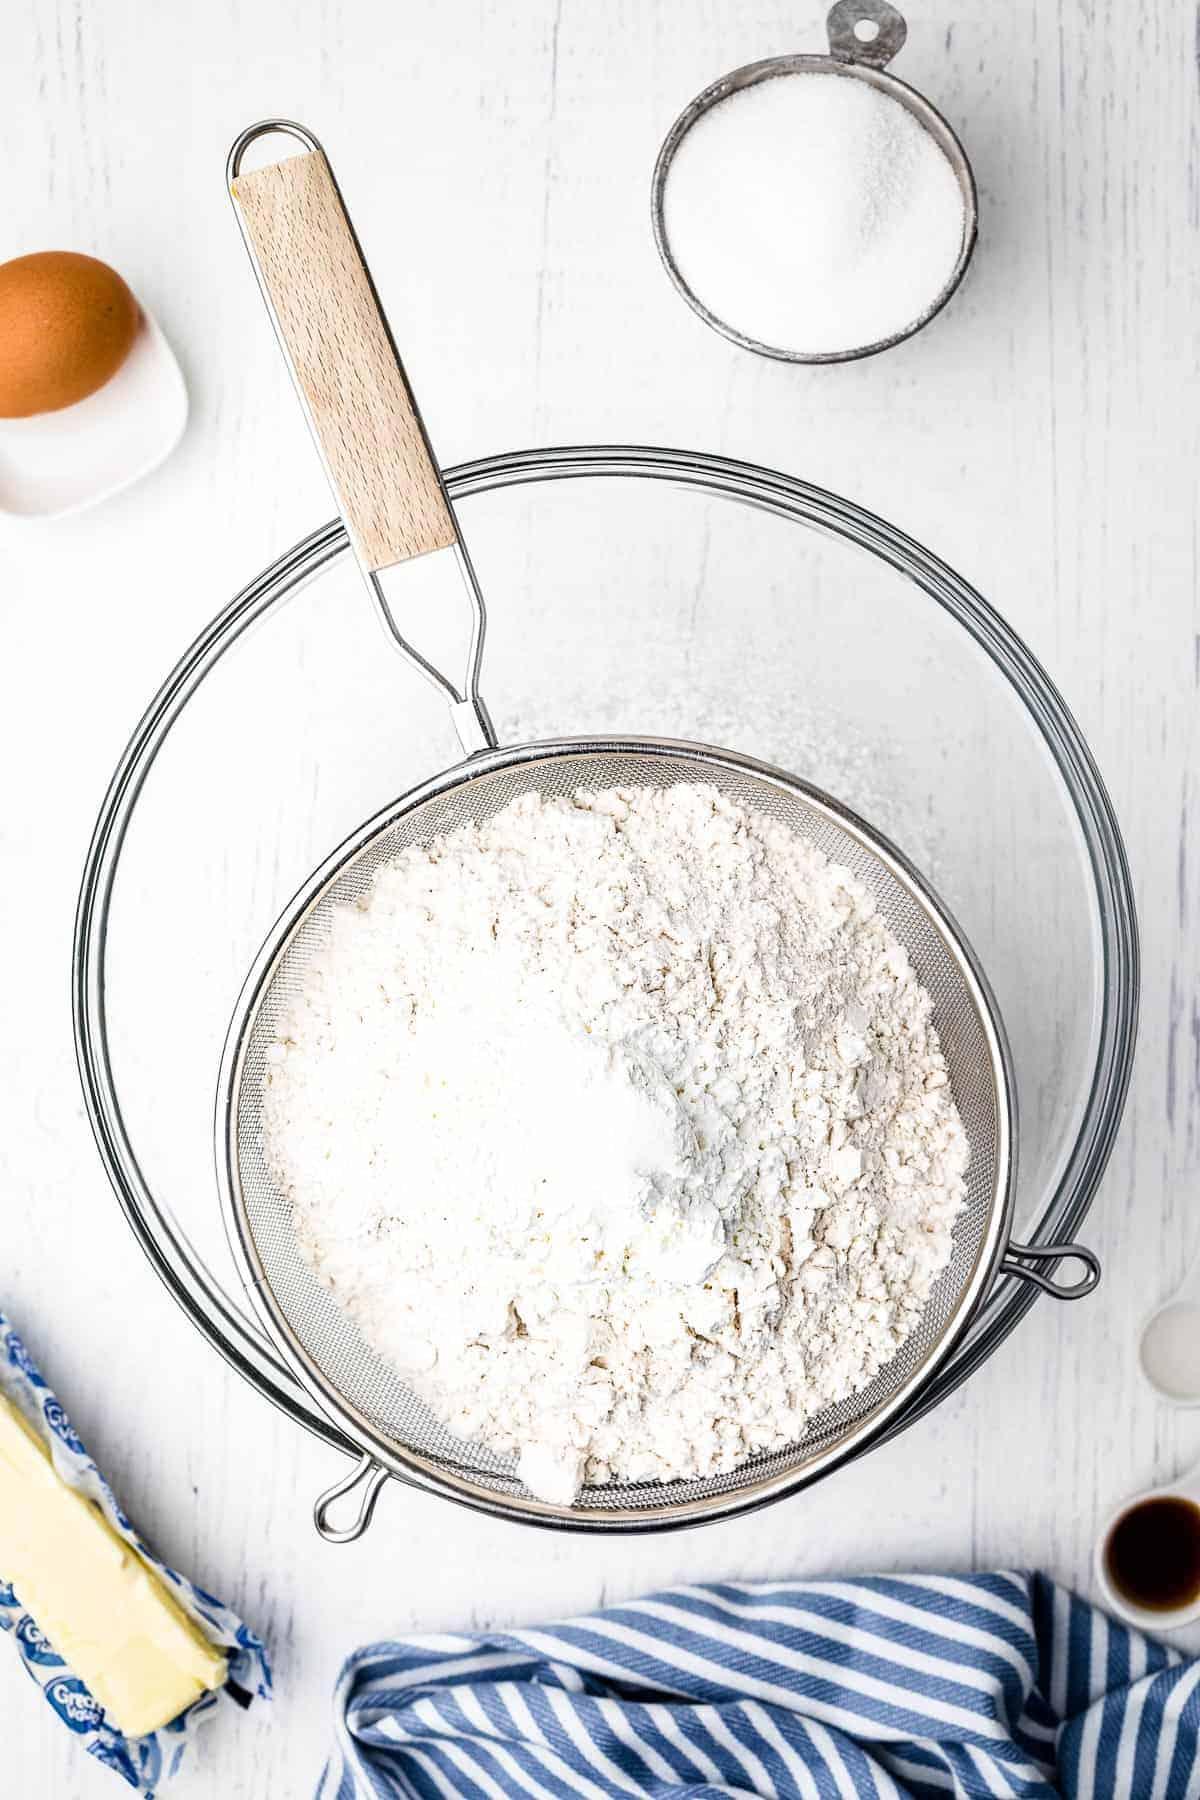 Sifting dry ingredients for sugar cookies